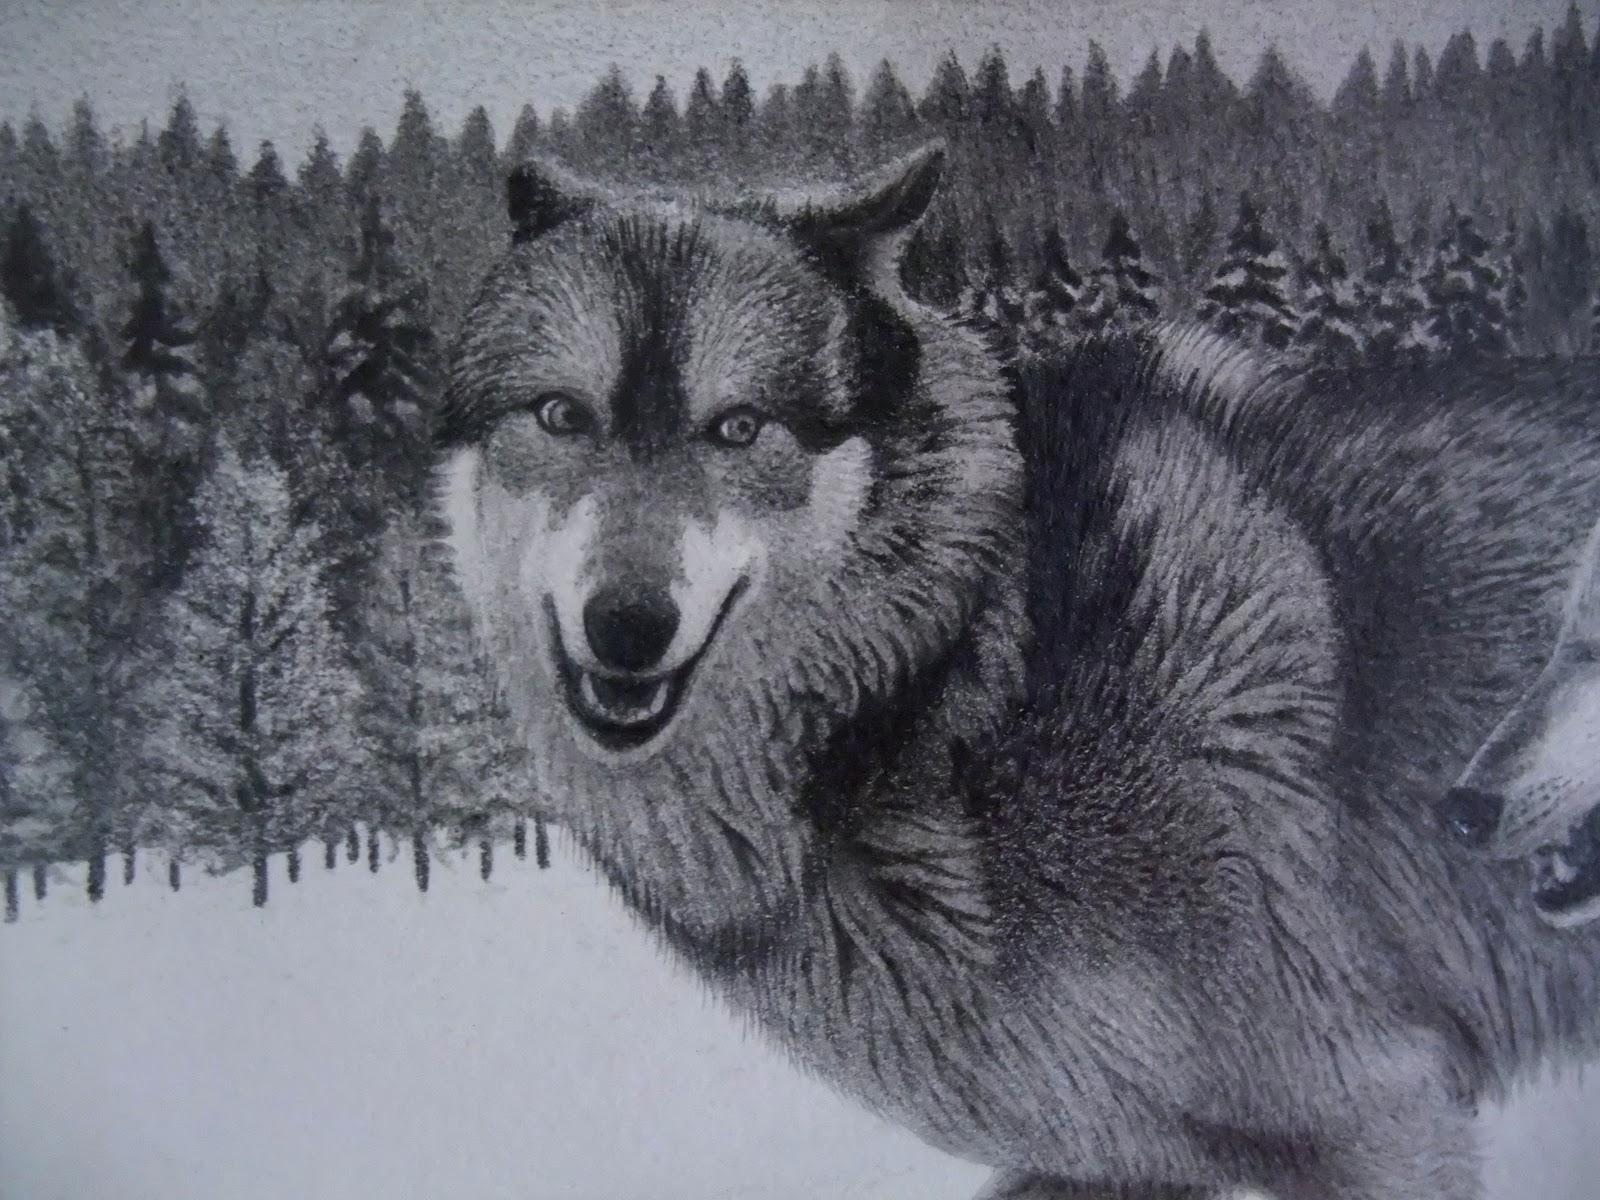 Antoine Roquain Dessin Animalier Wildlife Pencil Art Dessin De Loups